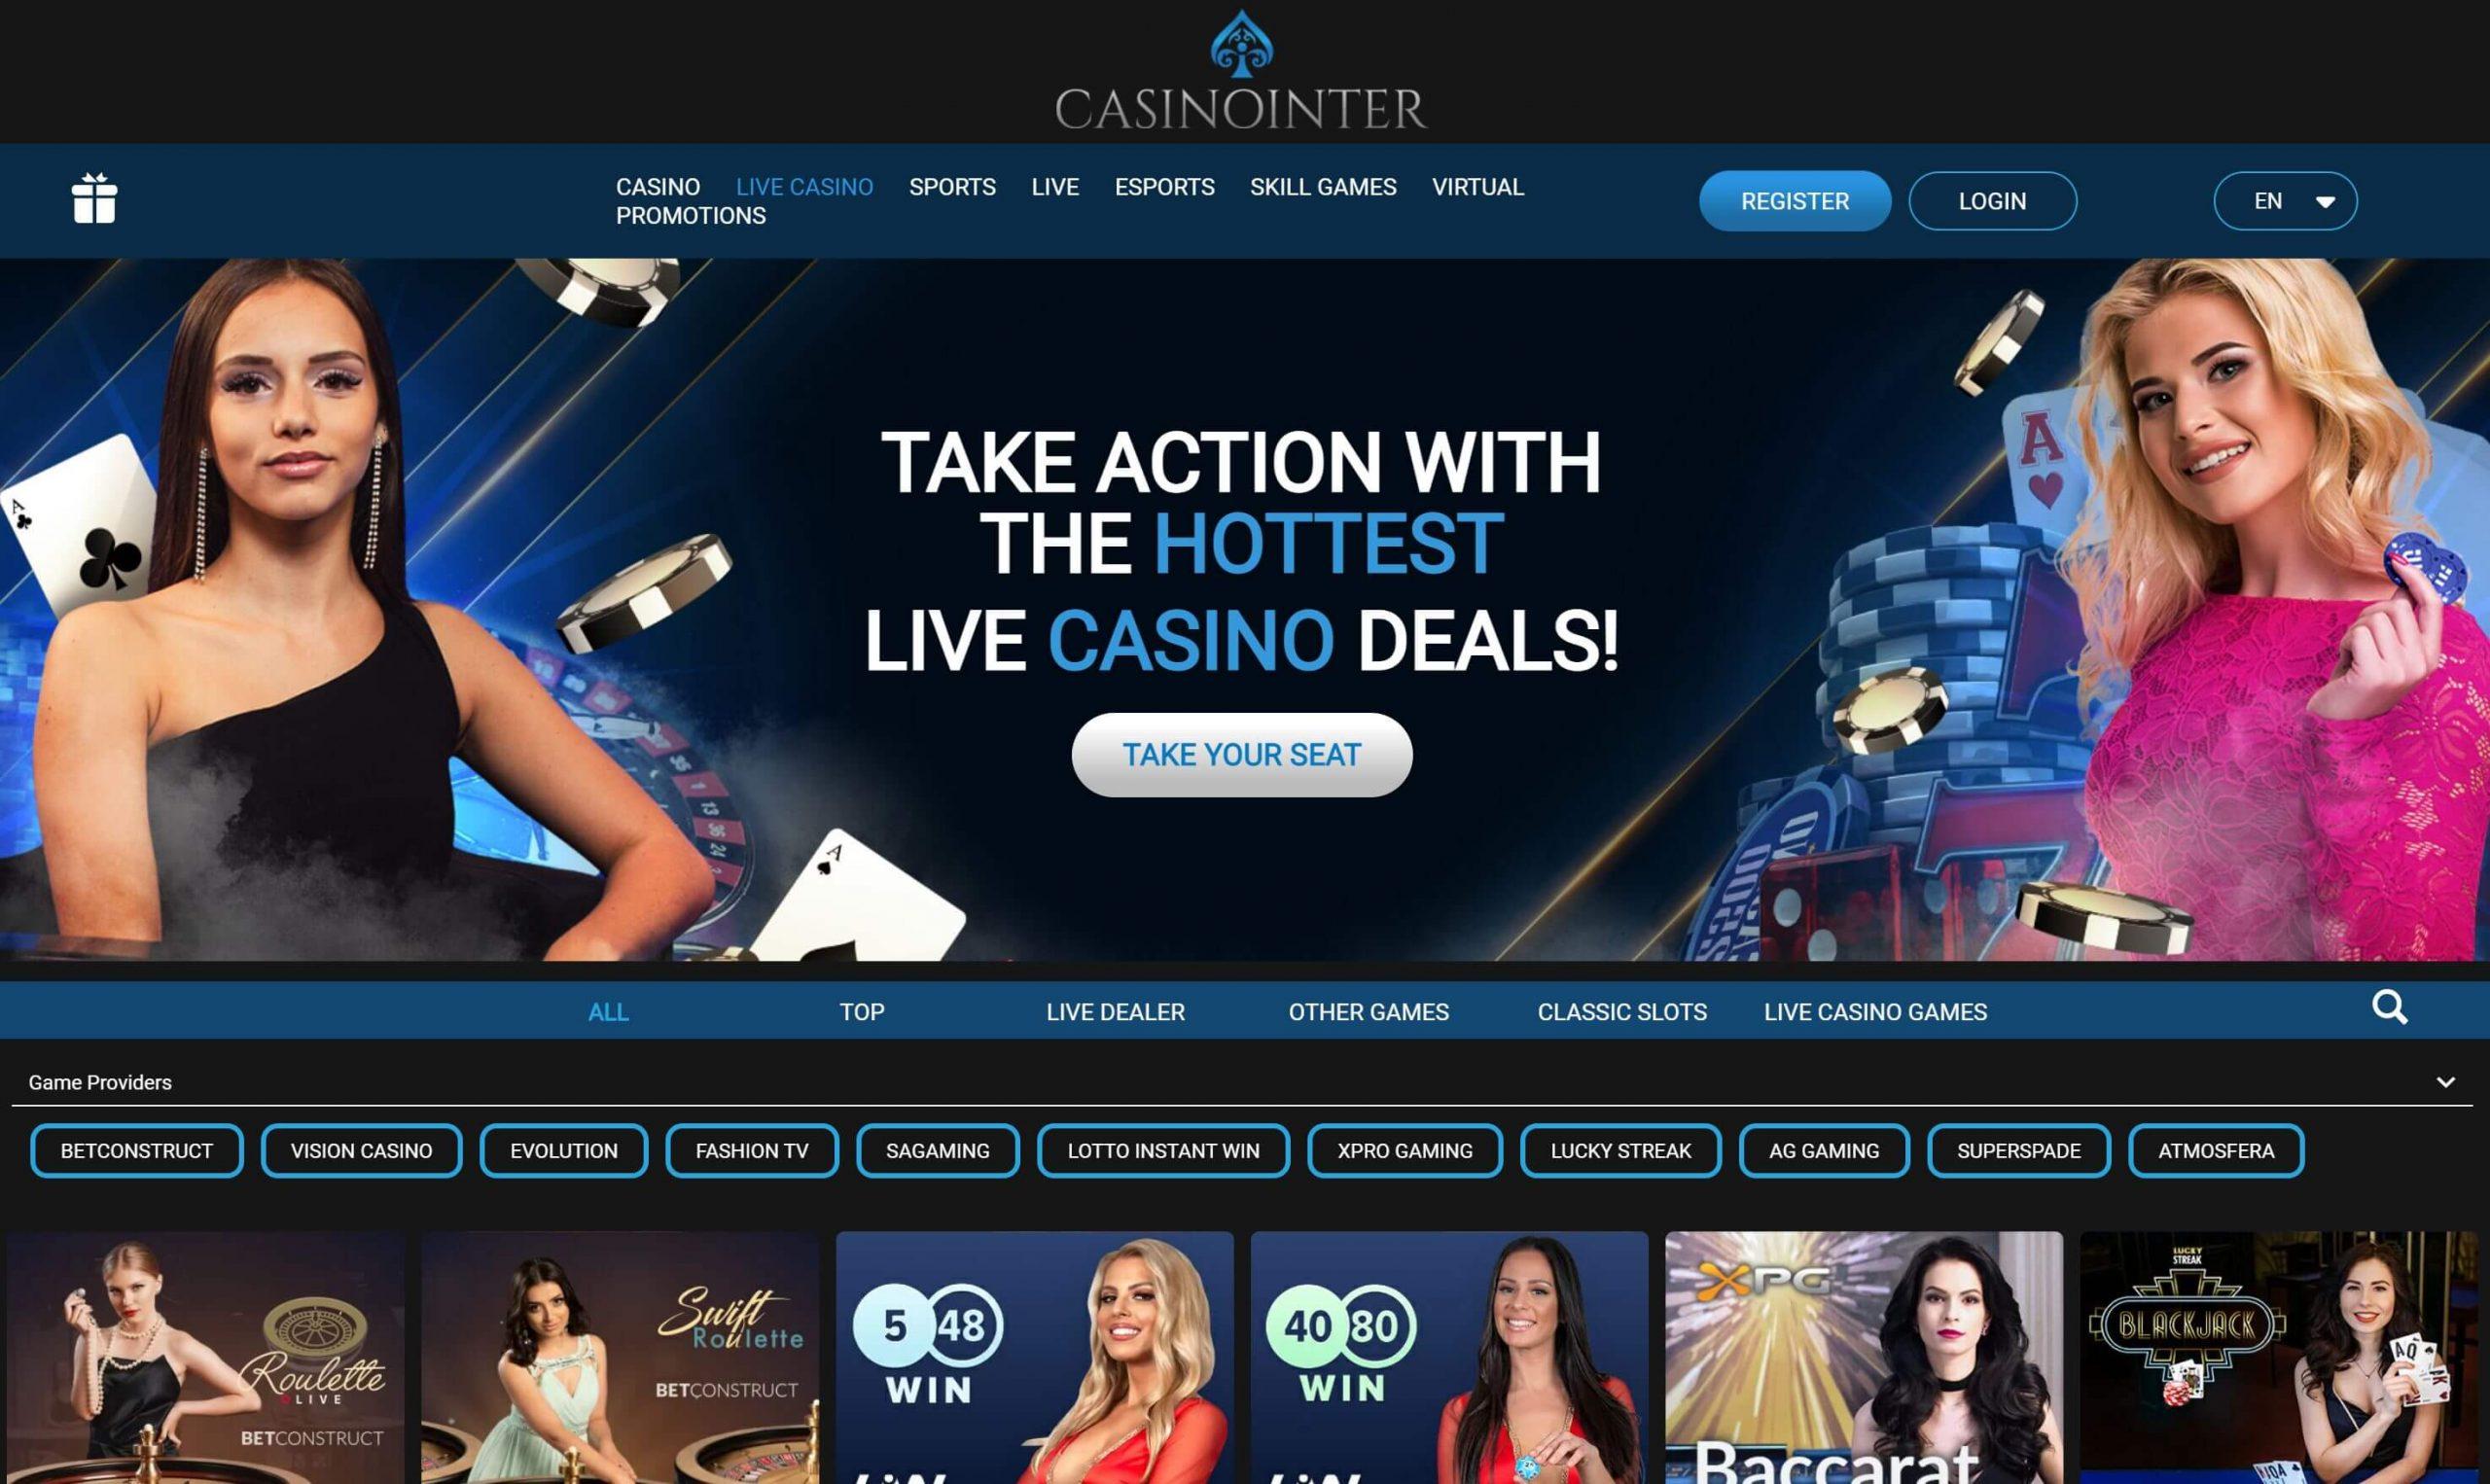 Casinointer Live Casino